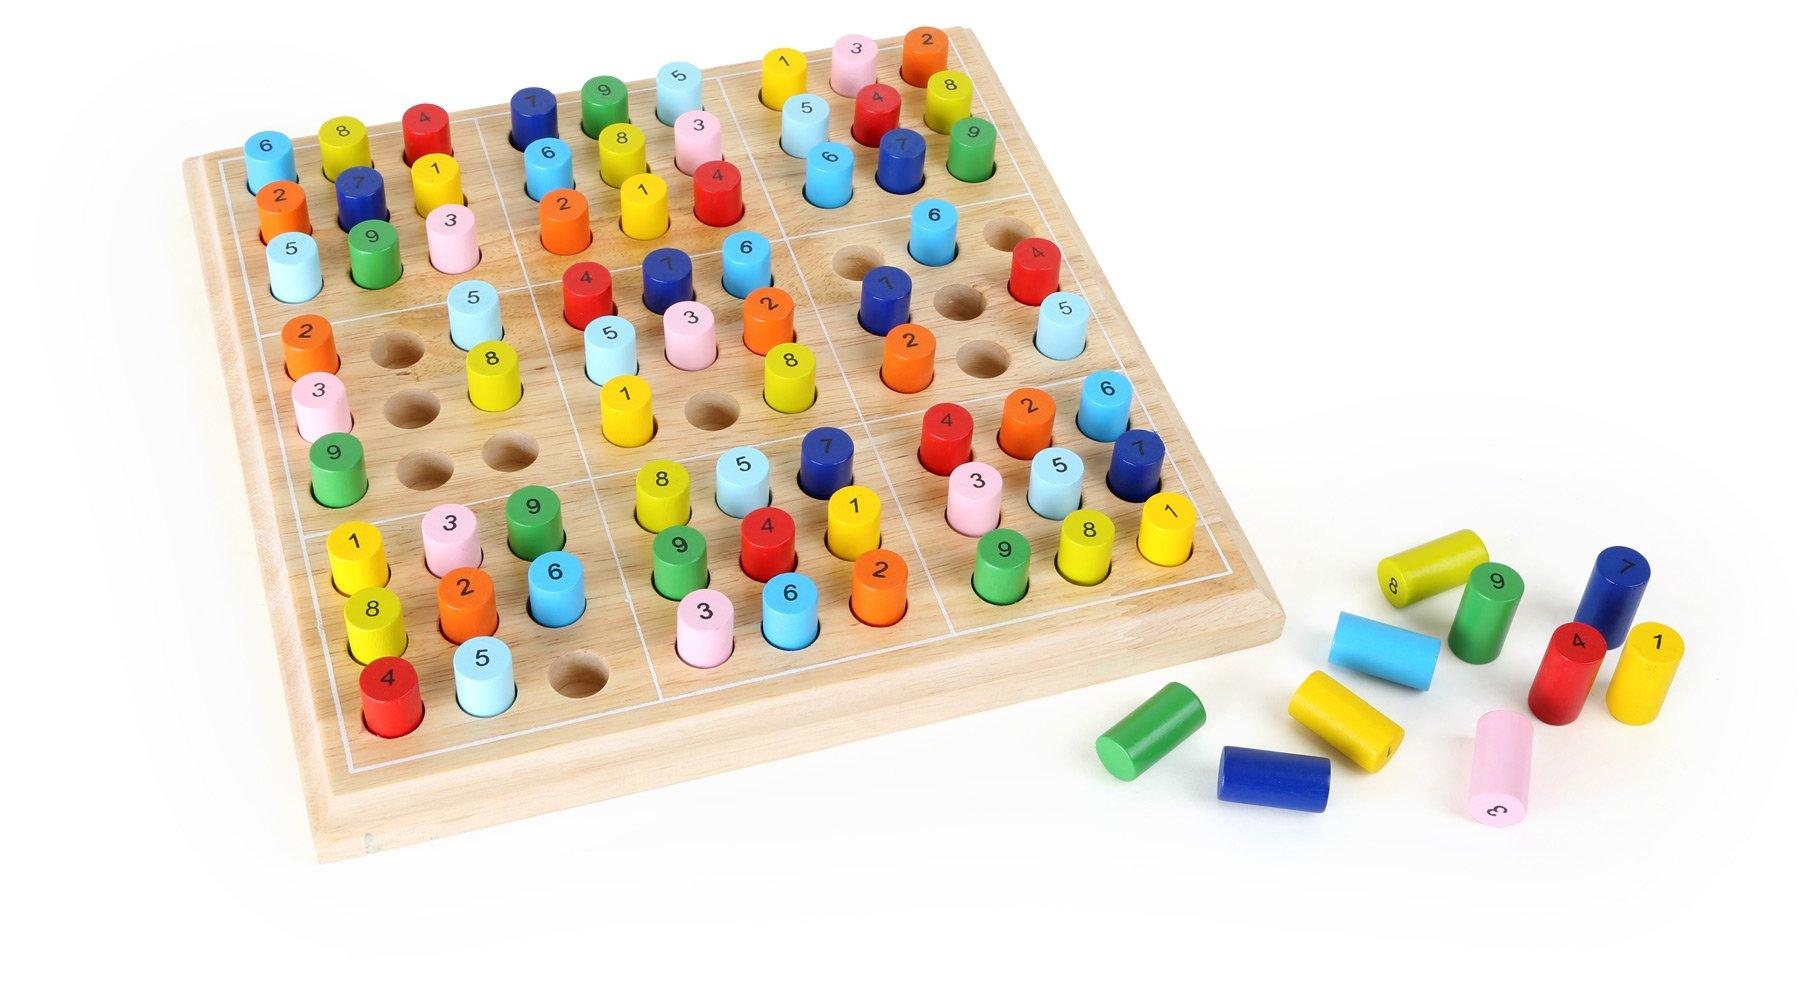 Legler Sudoku Coloured Educational Toy by Legler